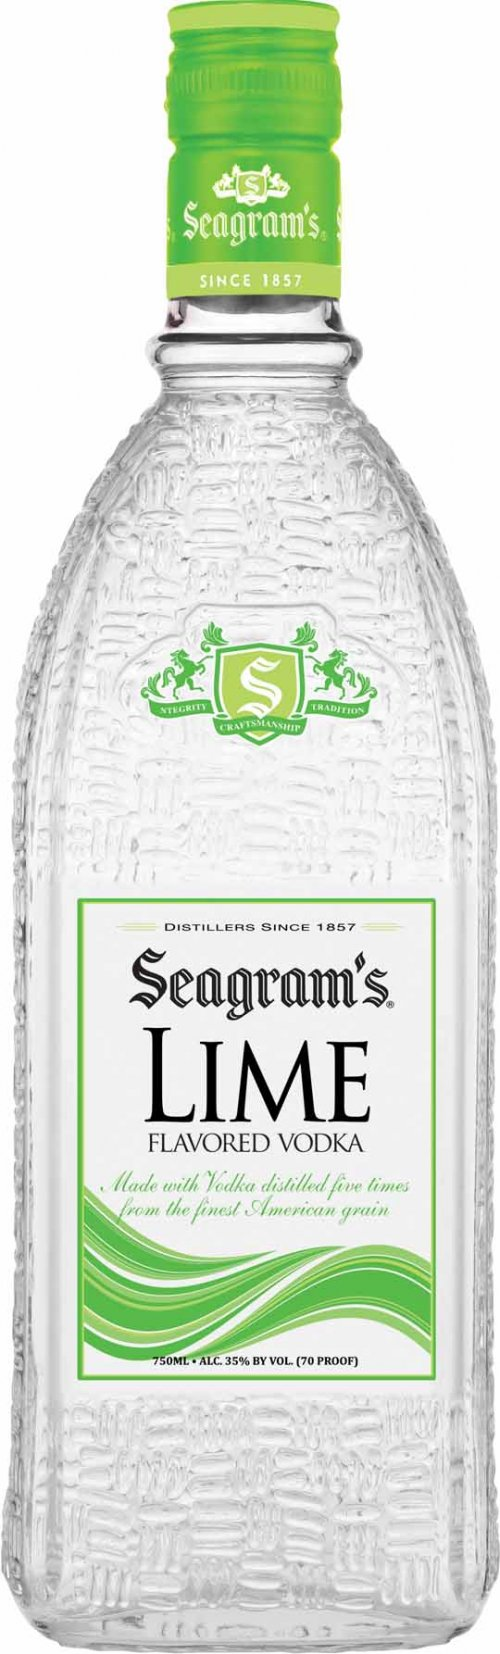 Seagrams Lime Vodka